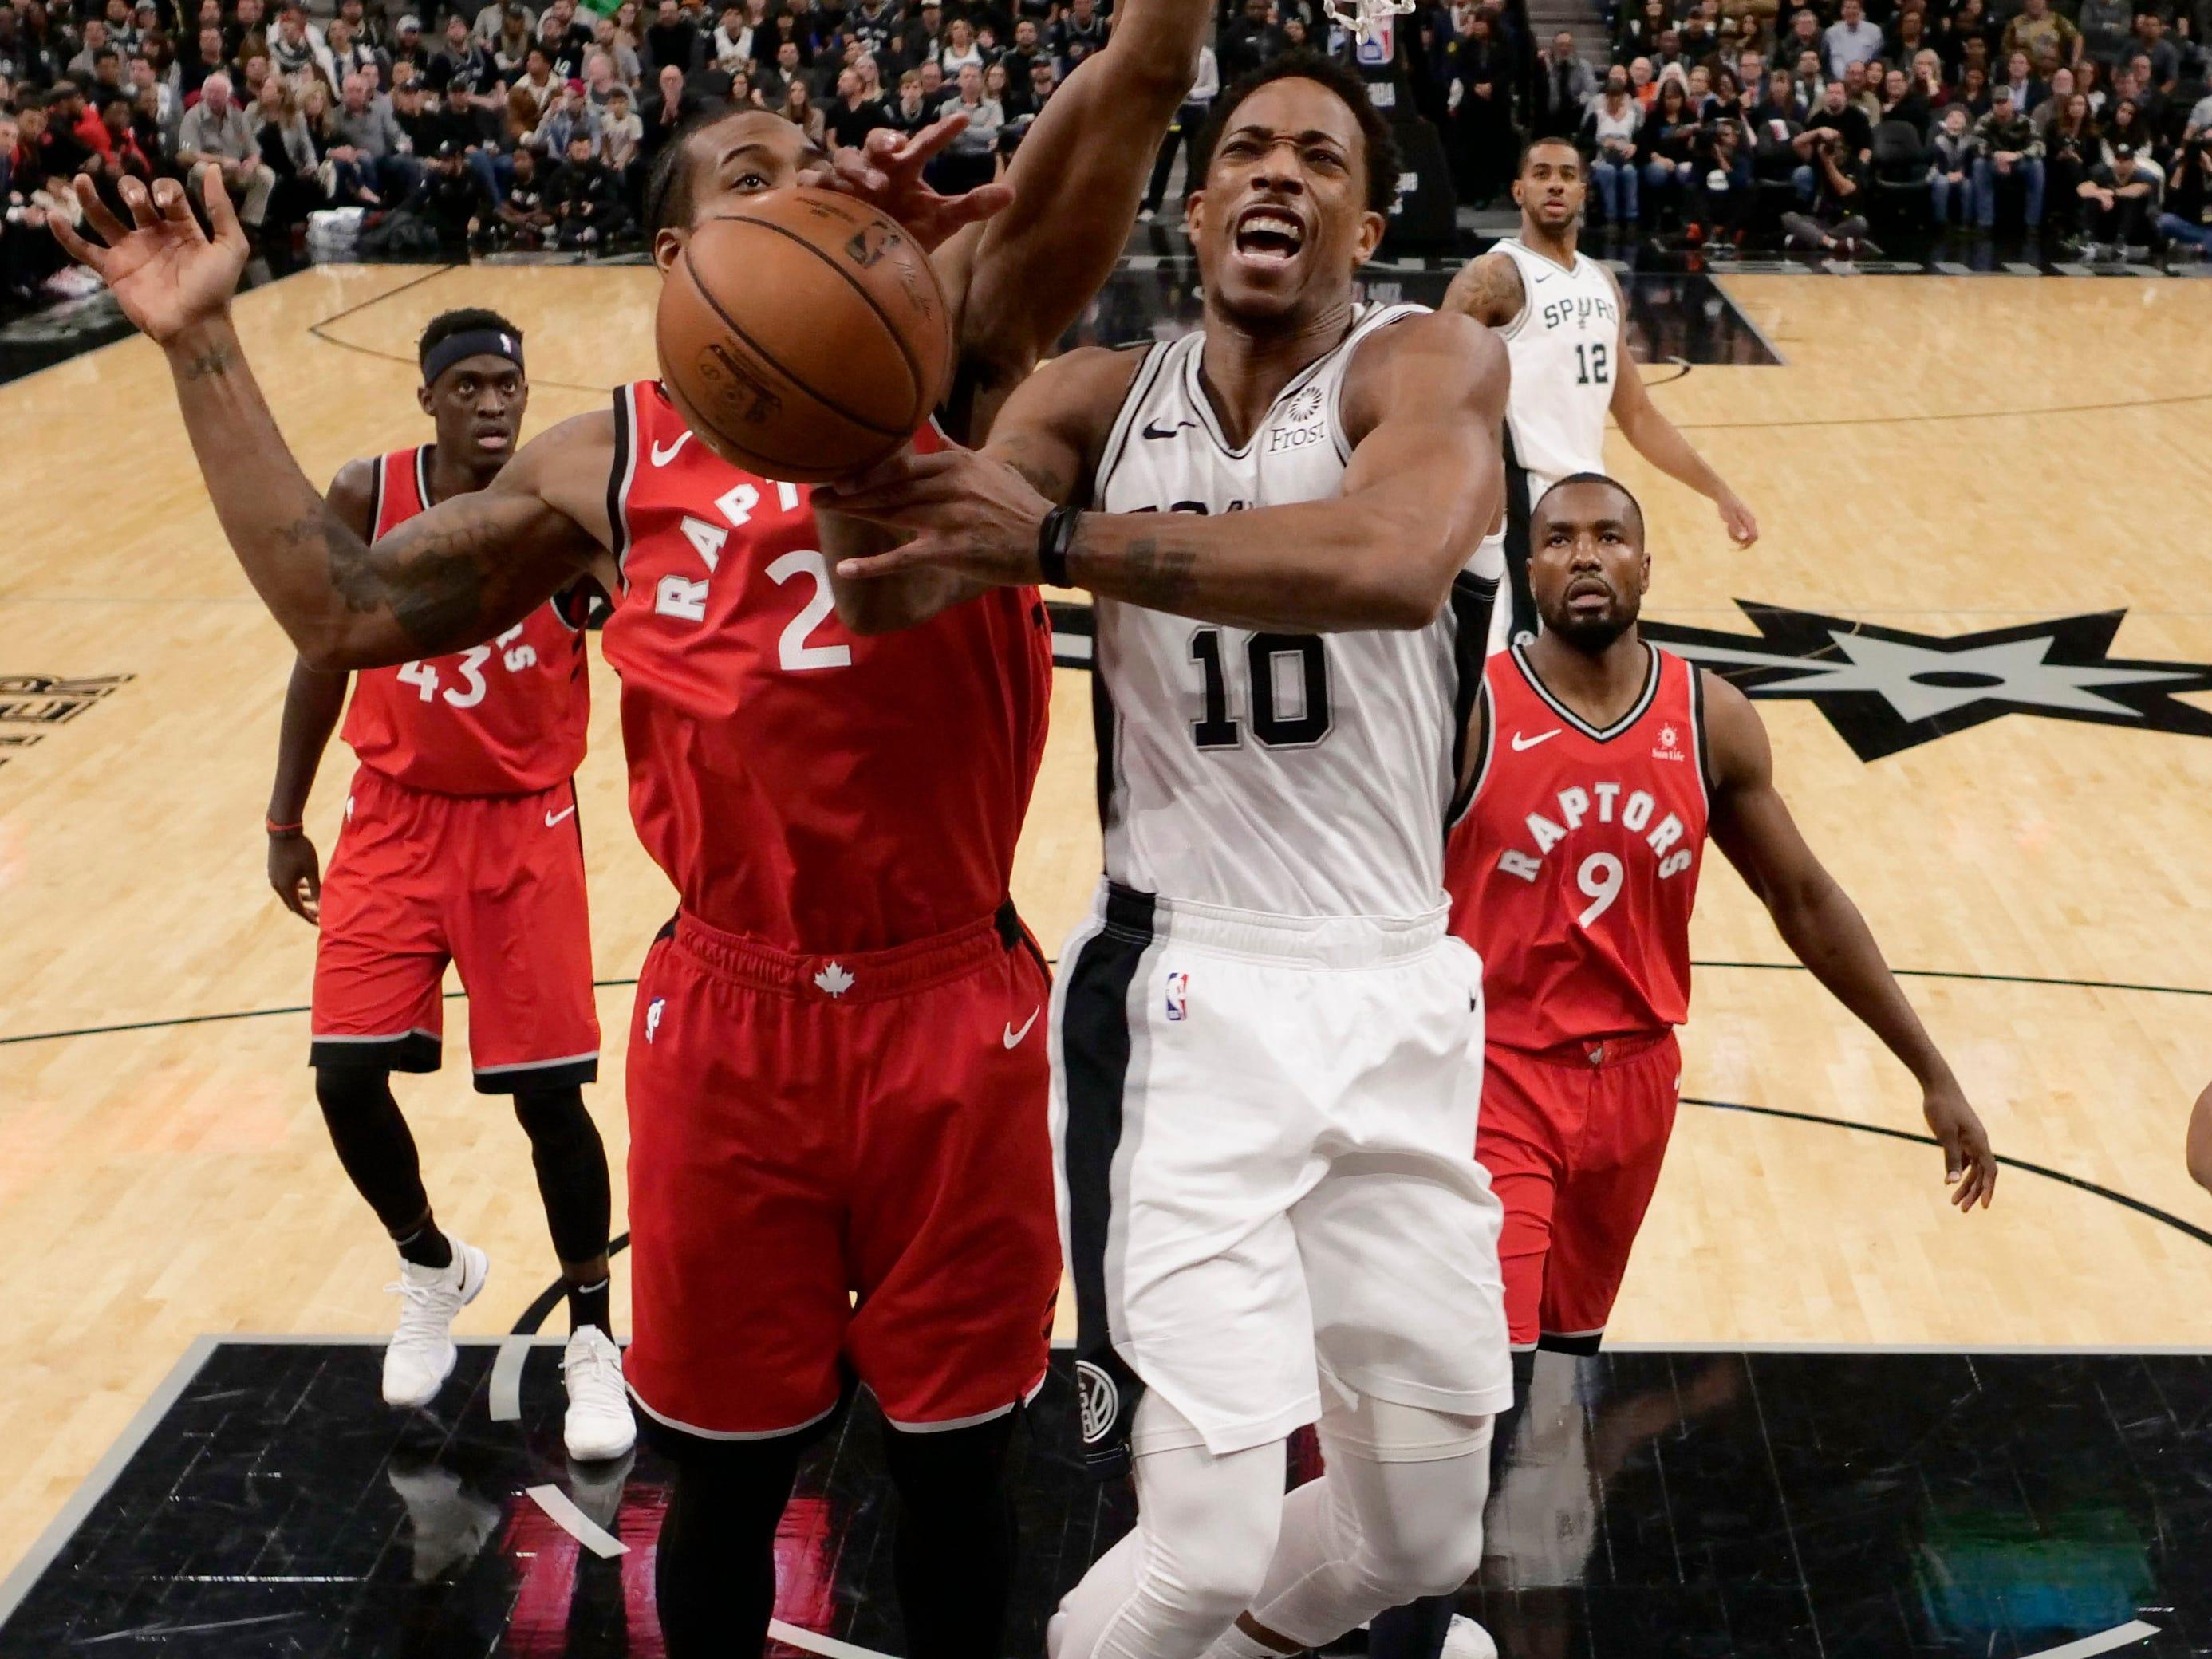 Jan. 3: Raptors defender Kawhi Leonard (2) fouls Spurs guard DeMar DeRozan (10) on a first-half drive to the basket in San Antonio.